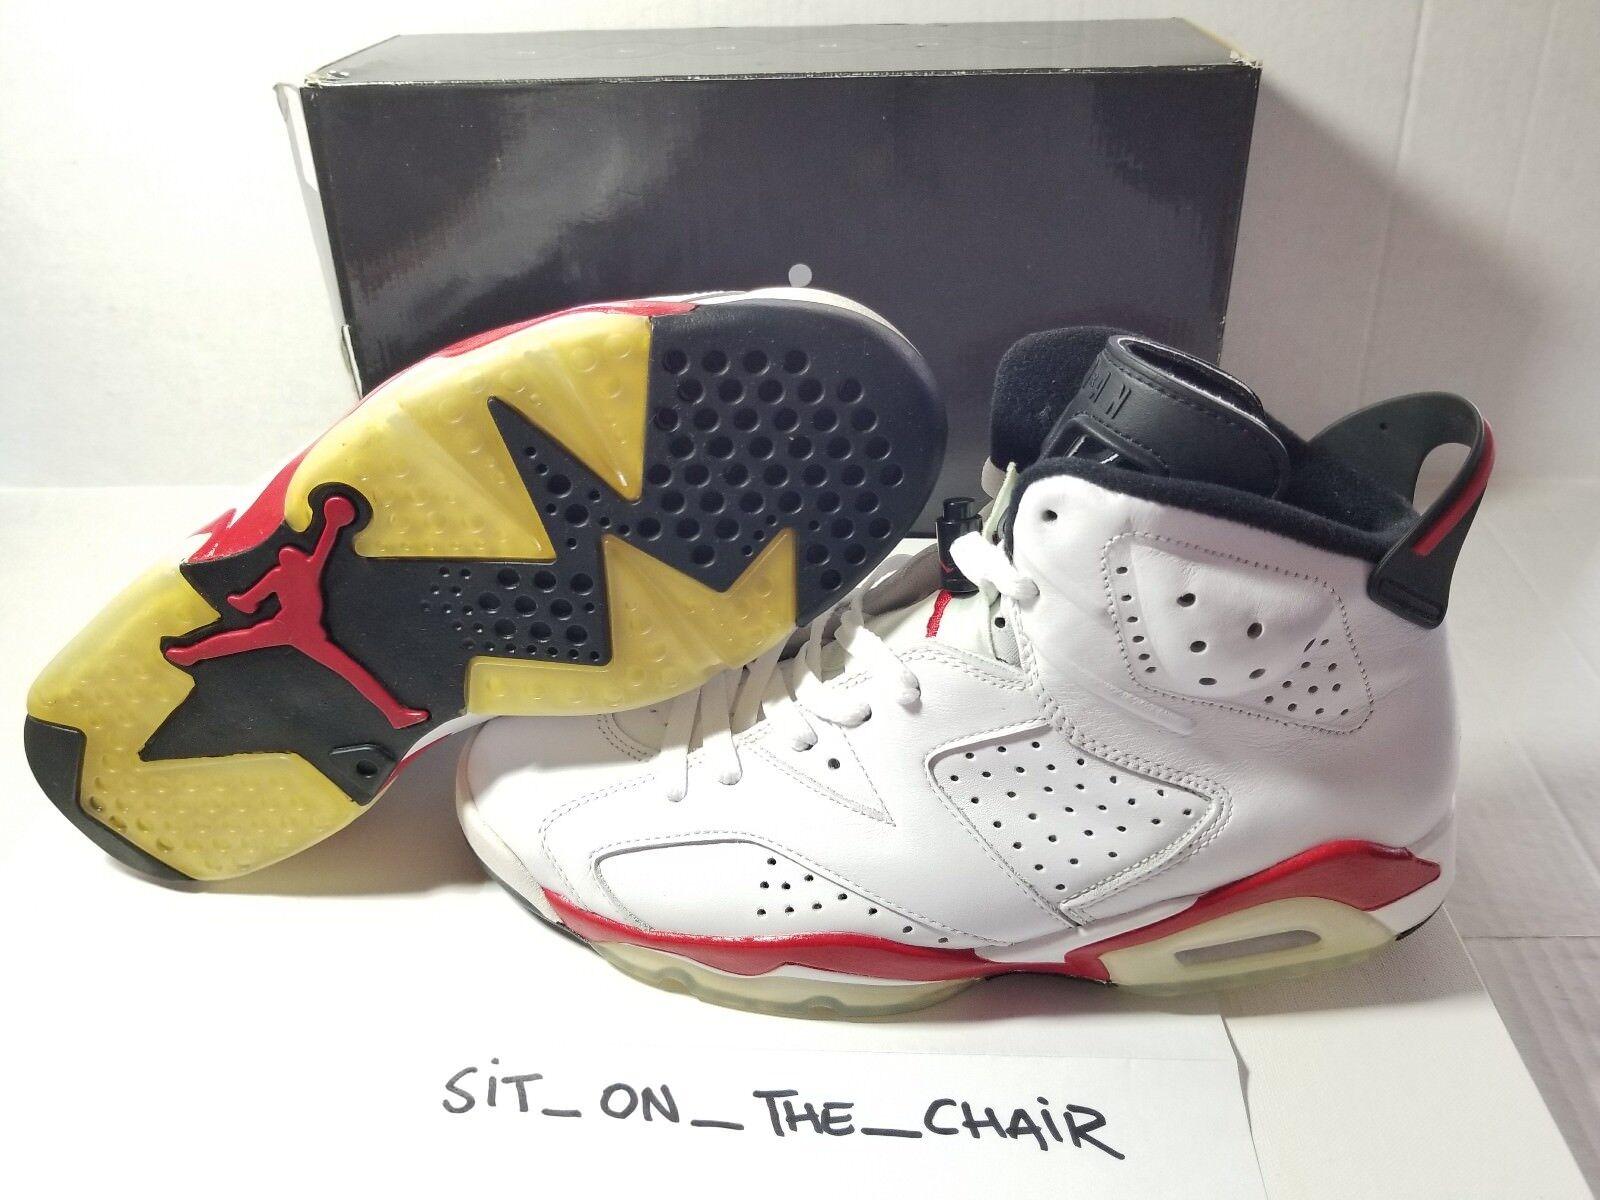 DS Nike Air Jordan VI 6 Retro SZ 9.5 CHICAGO WHTE VAR RED INFRED BLK 384664-102